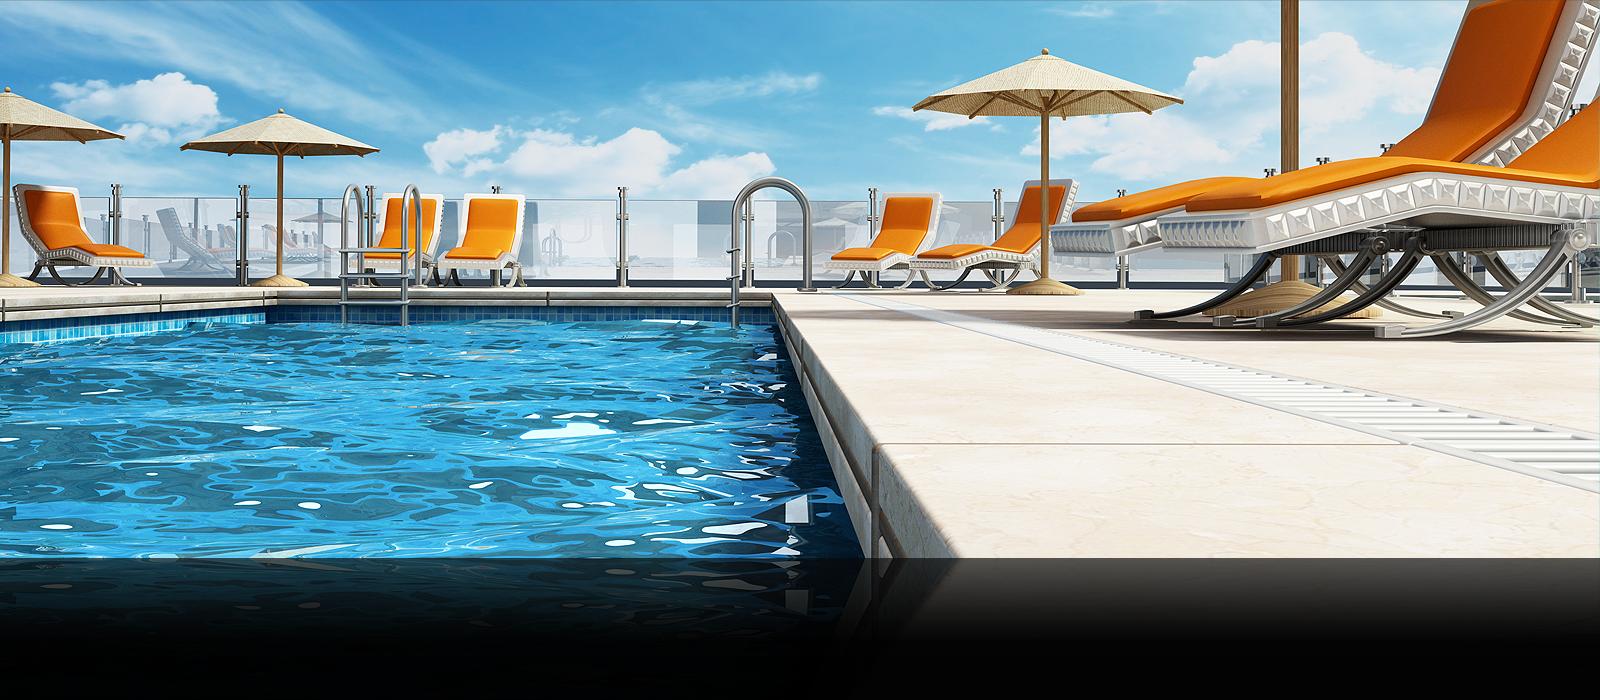 accessoires piscine piscine polyester pr s de tours attitude piscines. Black Bedroom Furniture Sets. Home Design Ideas